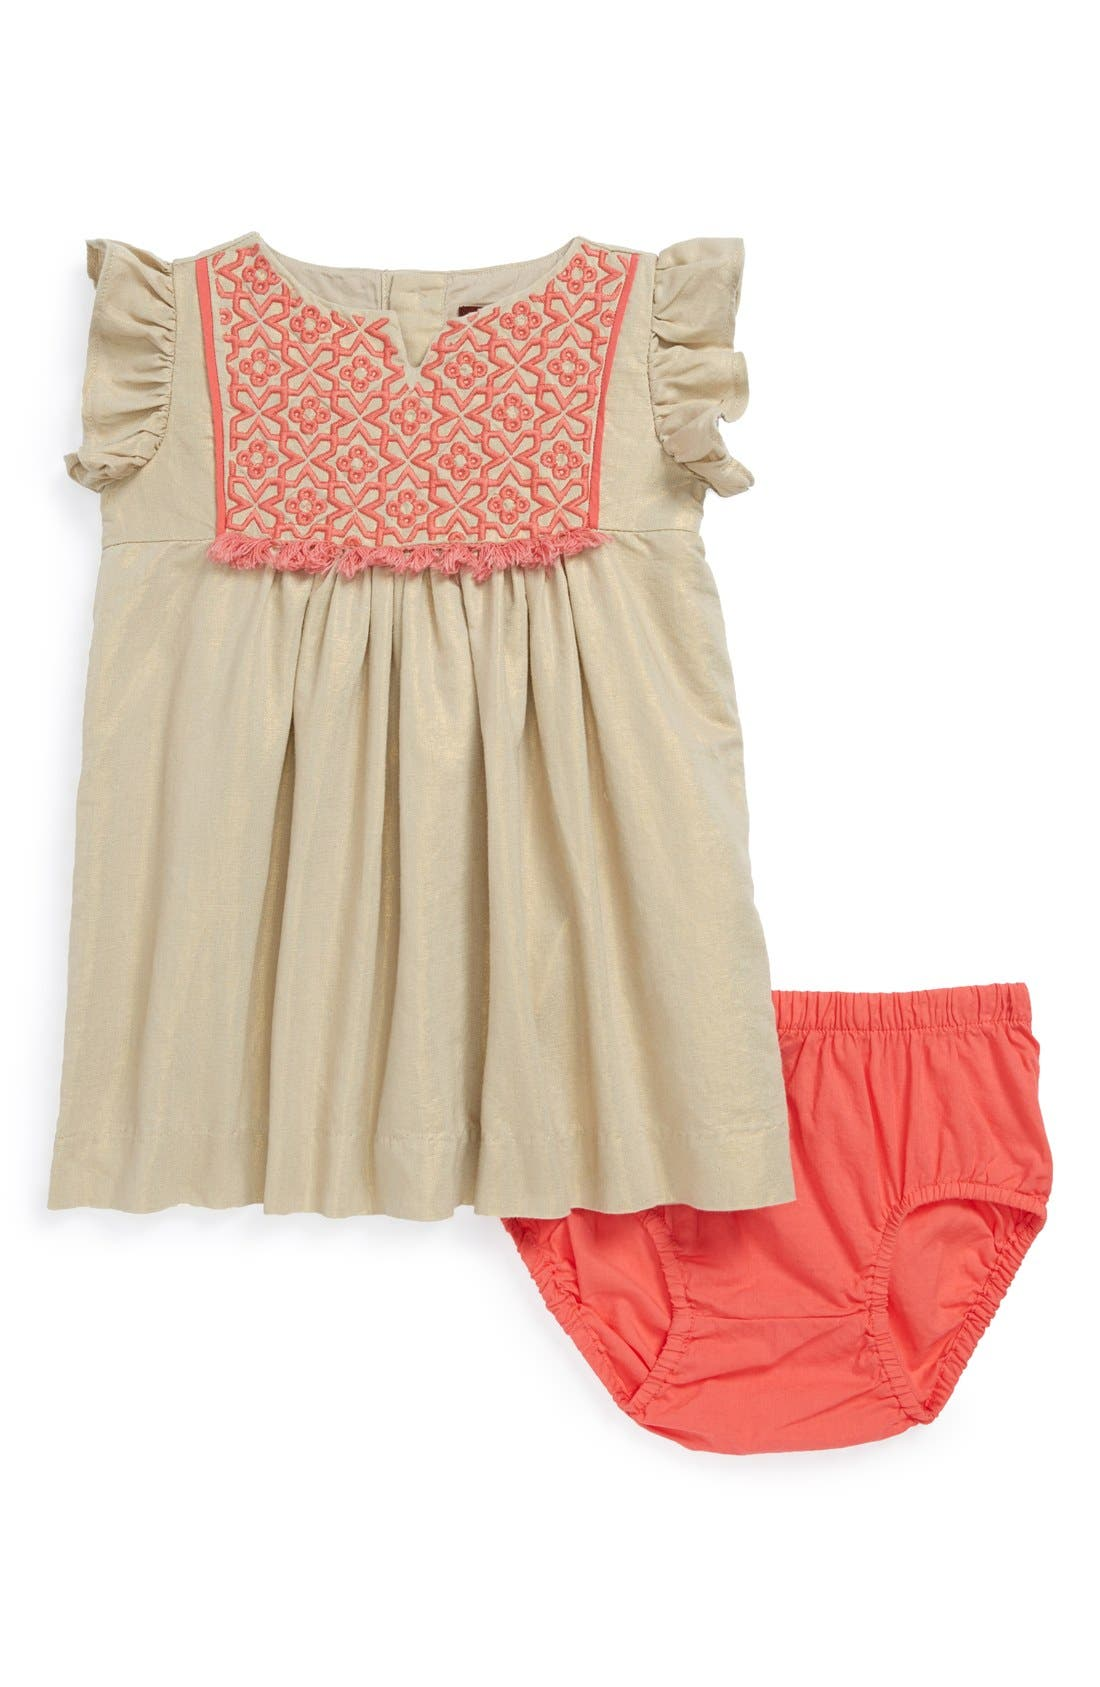 Main Image - Tea Collection 'Nabila Sparkle' Flutter Sleeve Dress & Bloomers (Baby Girls)